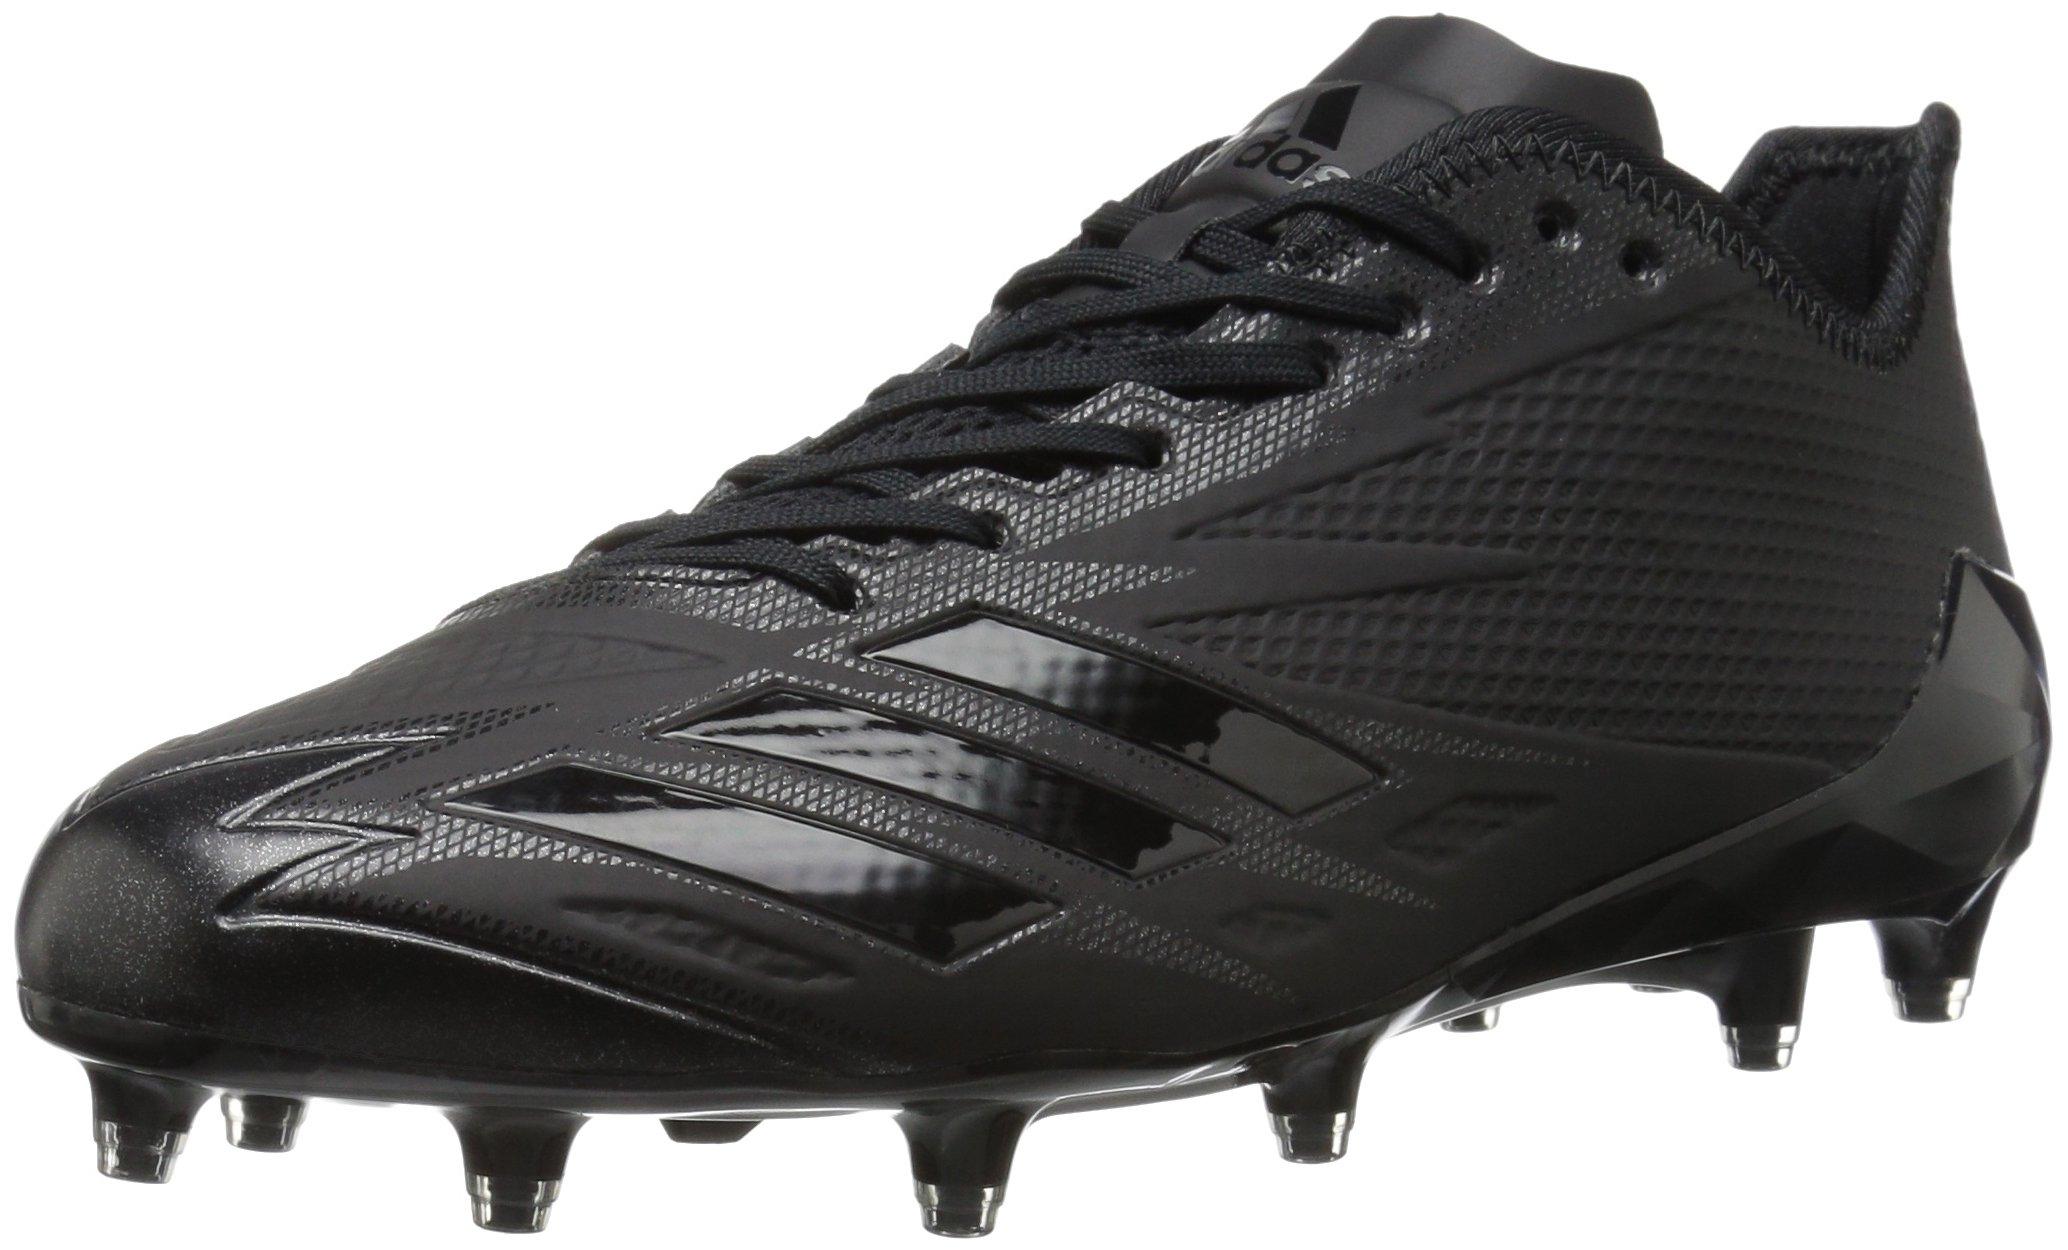 adidas Men's Freak X Carbon Mid Football Shoe, Black/Black/Black, 15 Medium US